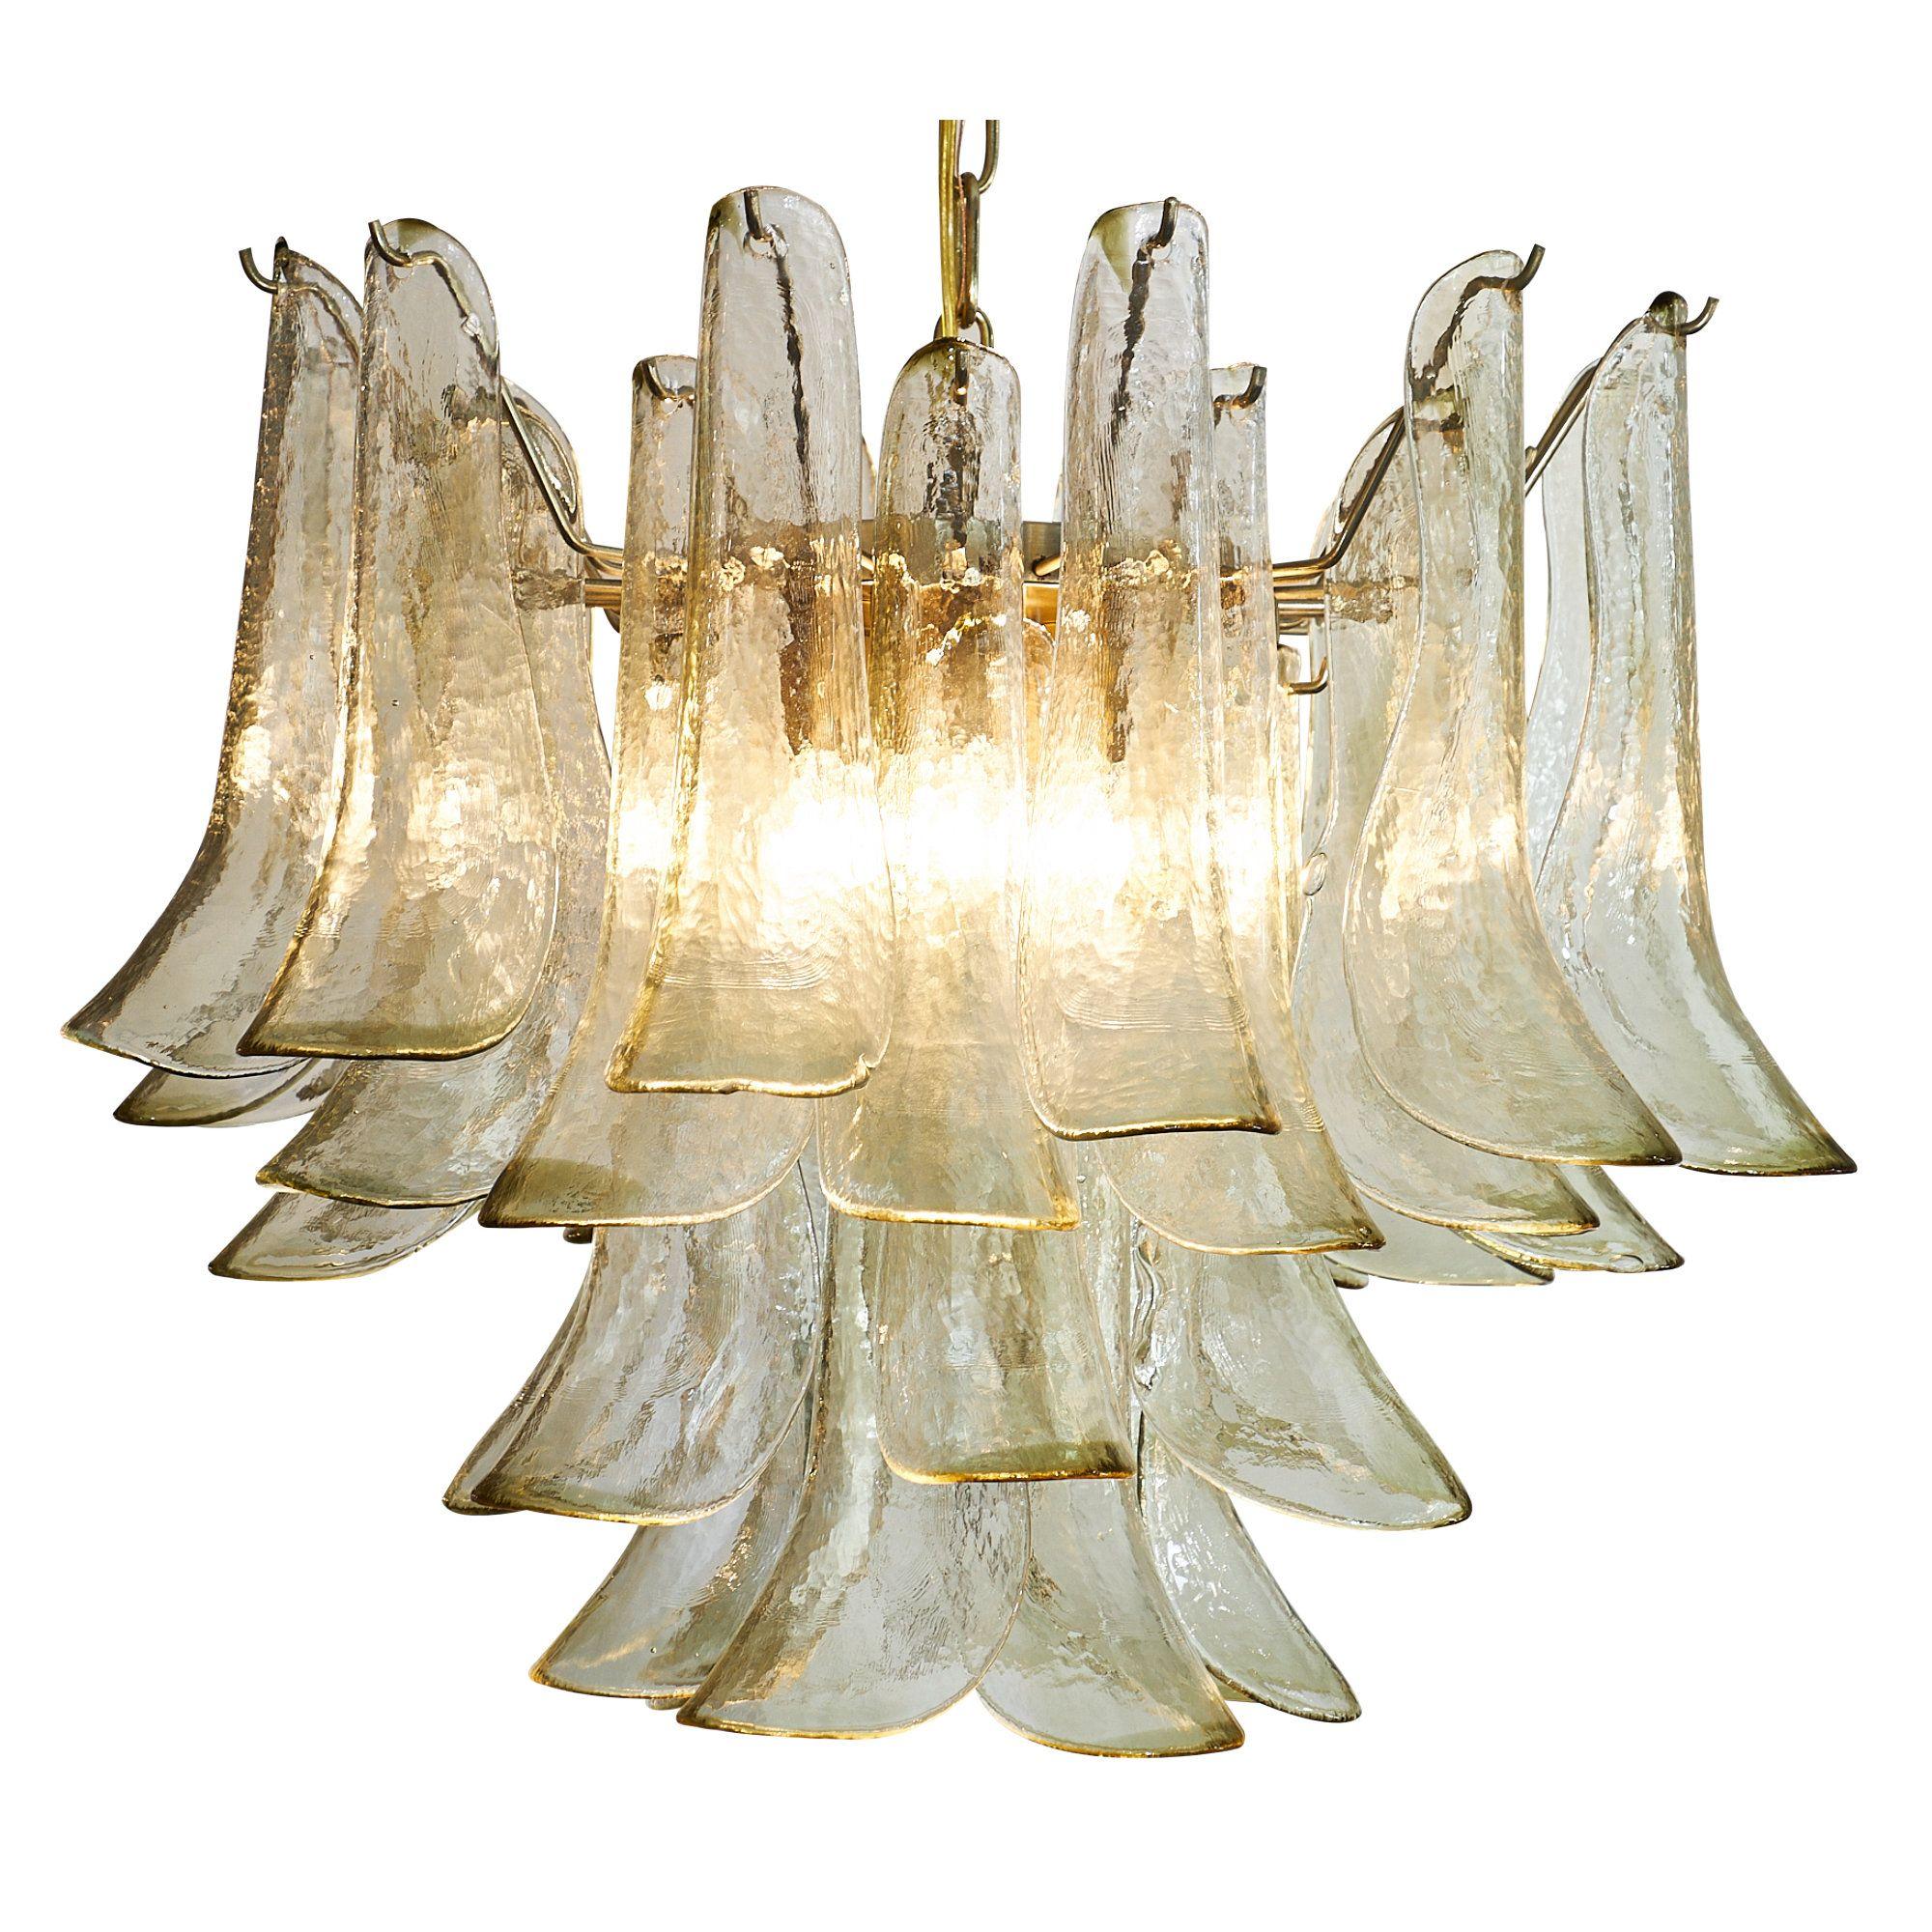 Murano Glass Petal Chandelier | Murano glass, Chandeliers and Glass